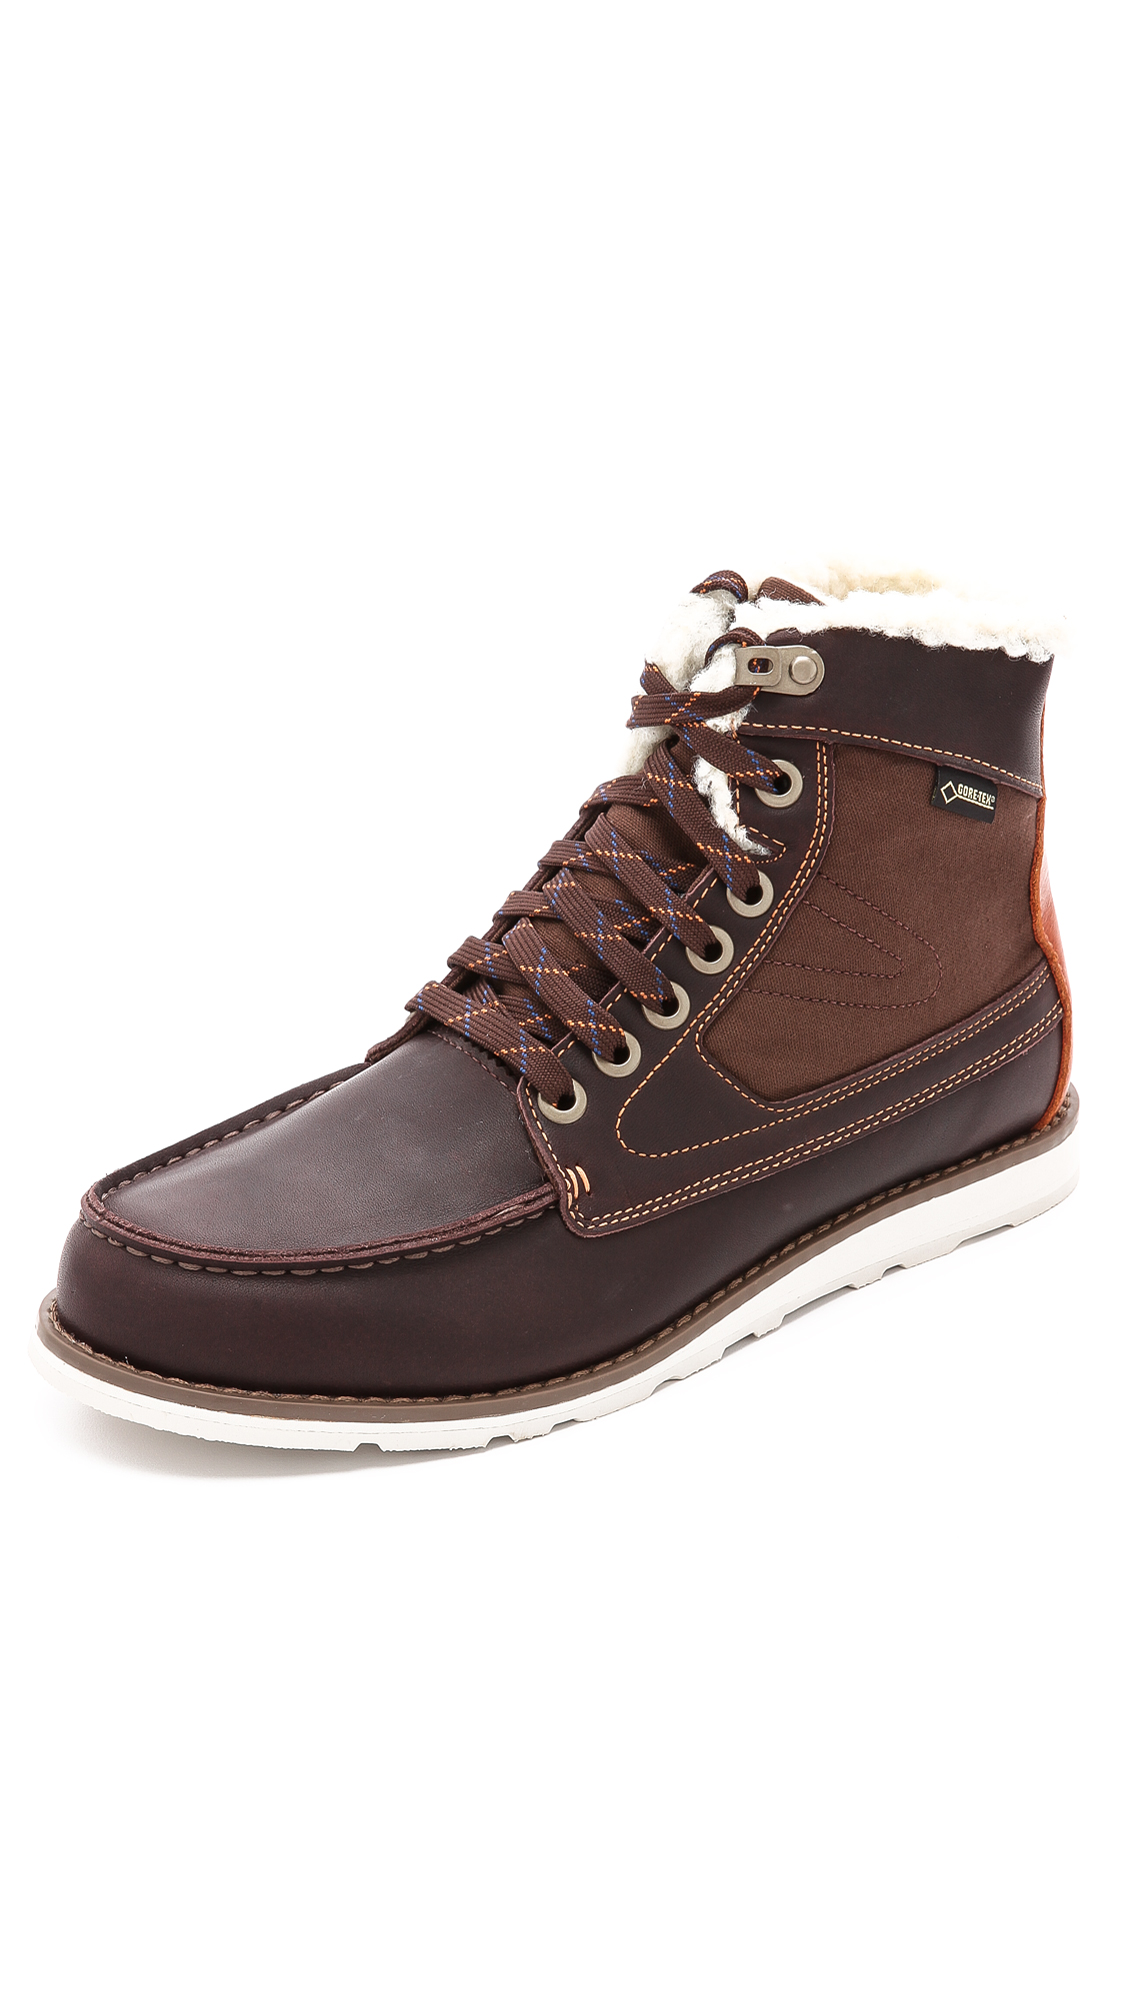 Tretorn Garde Stovel Vinter Gtx Boots East Dane D Island Shoes Style Hikers Dm Mens Leather Cokelat